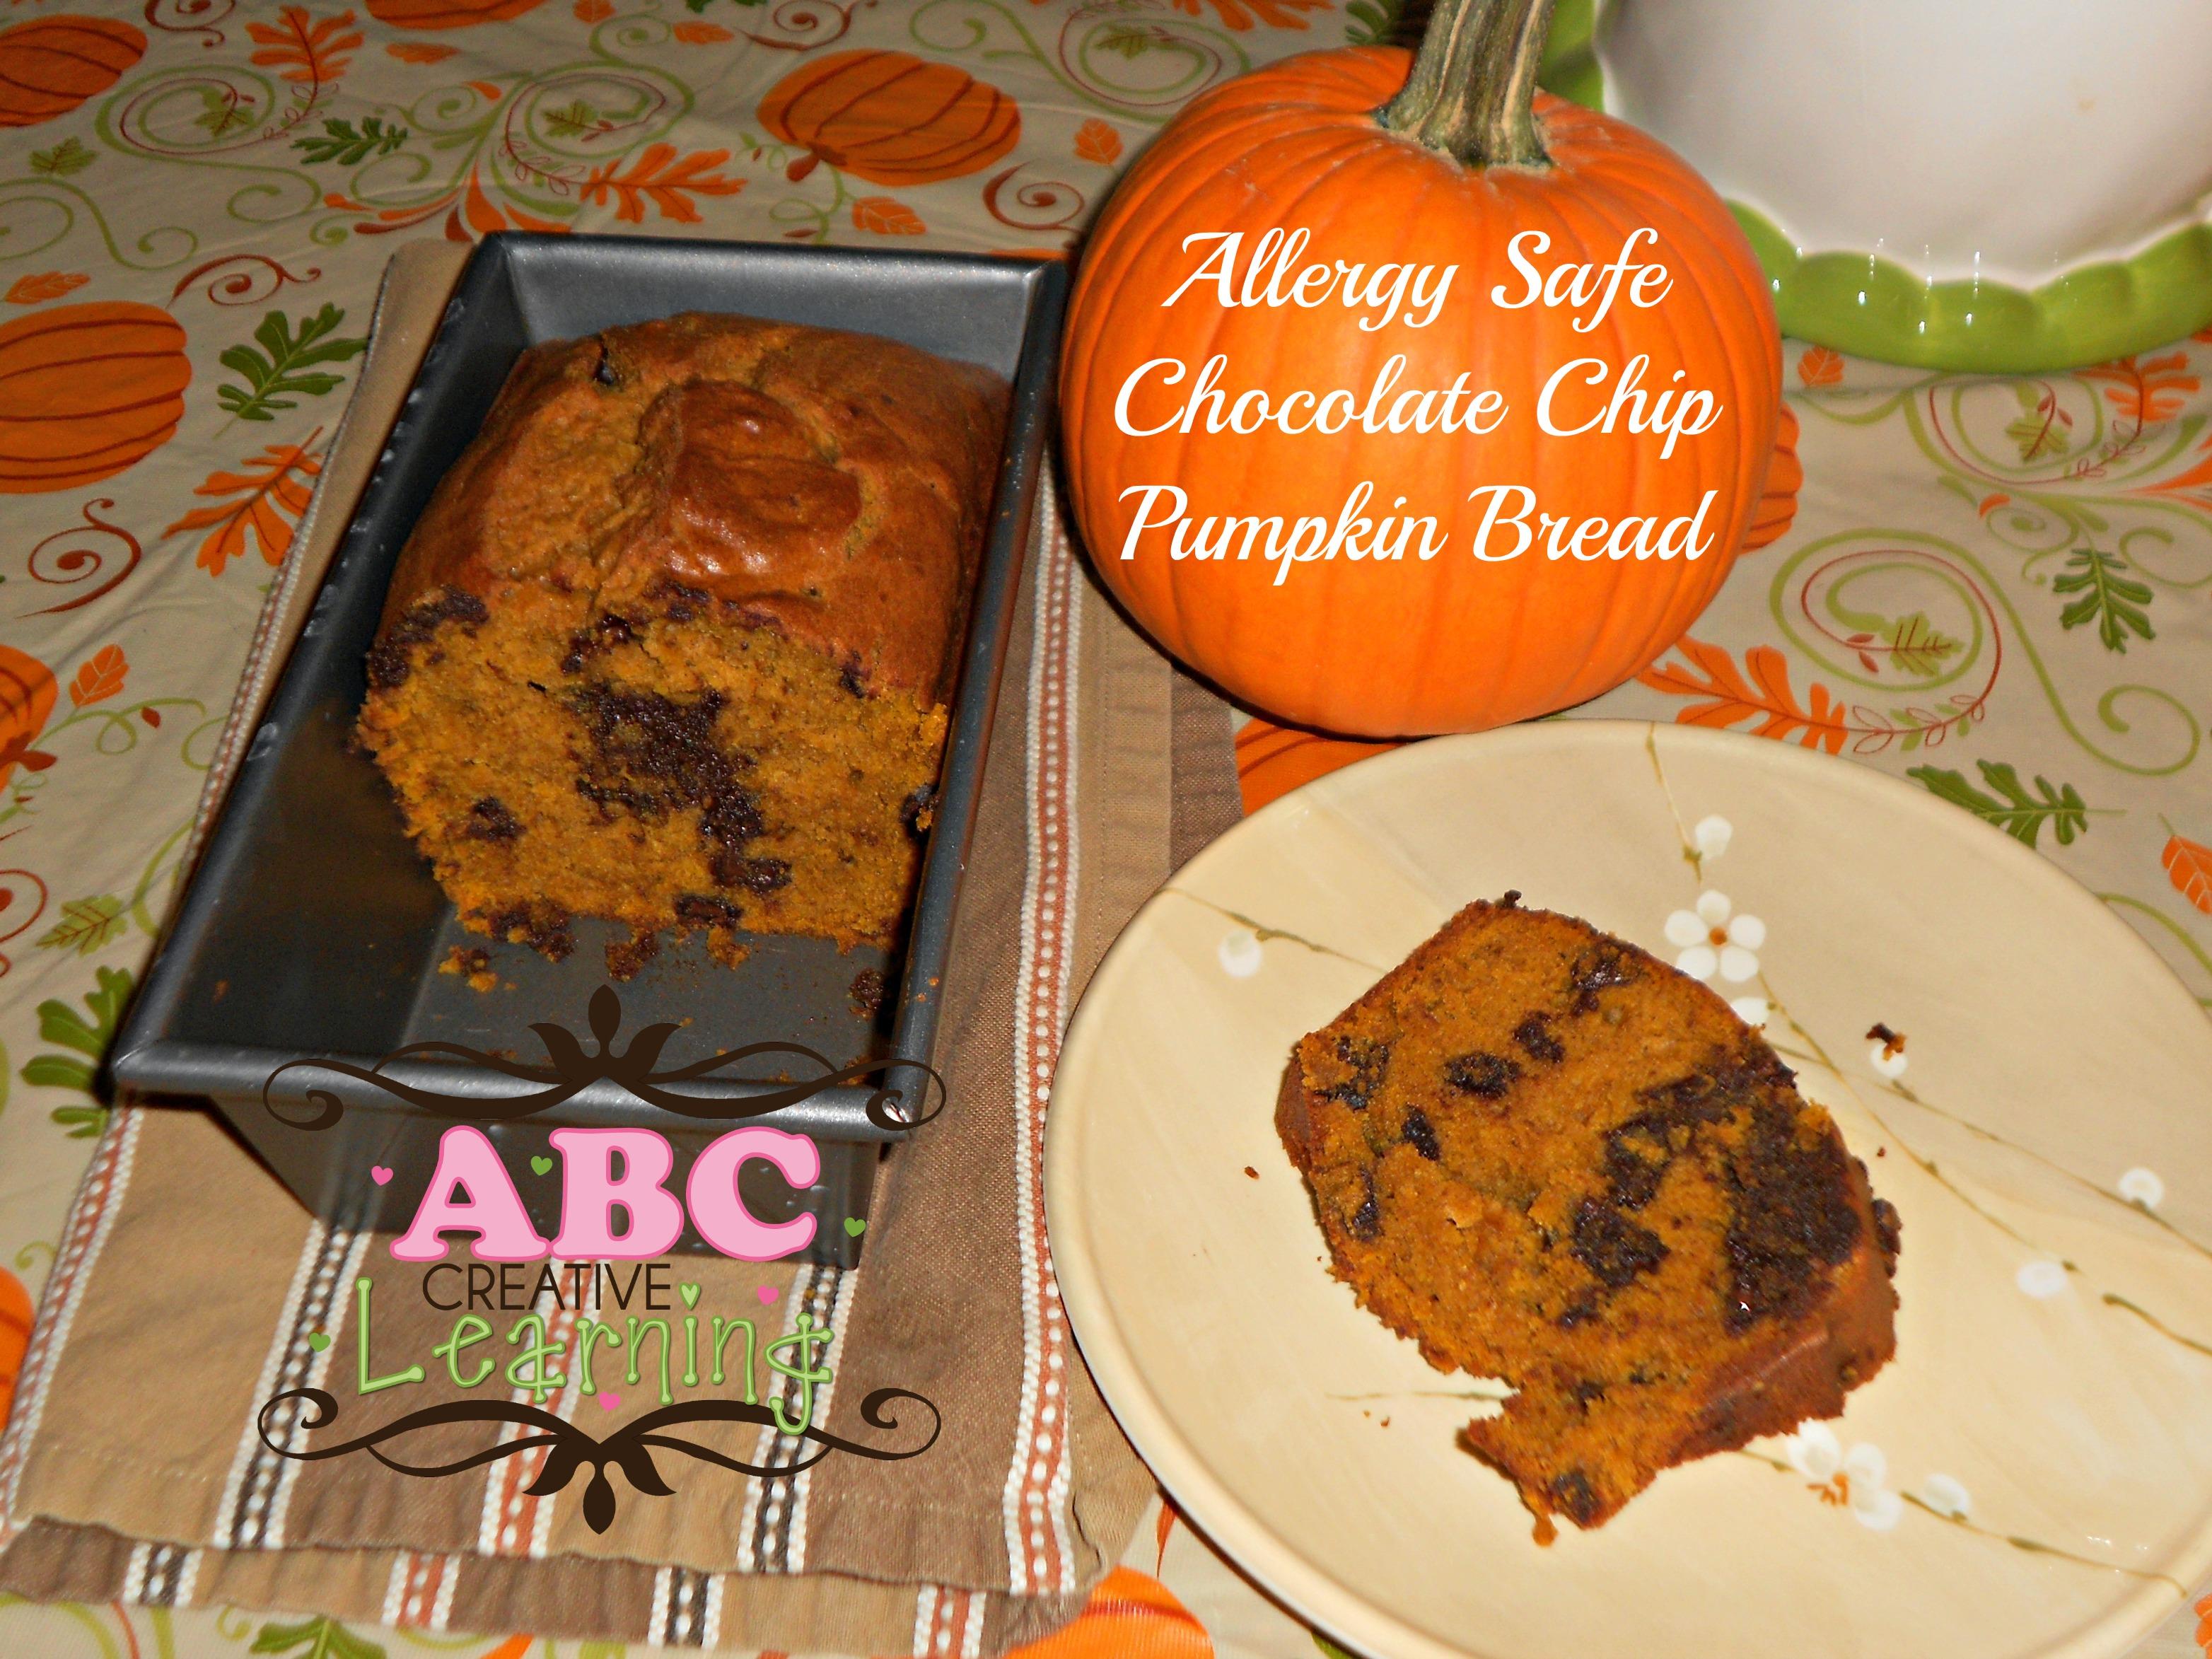 Allergy Safe Chocolate Chip Pumpkin Bread Recipe